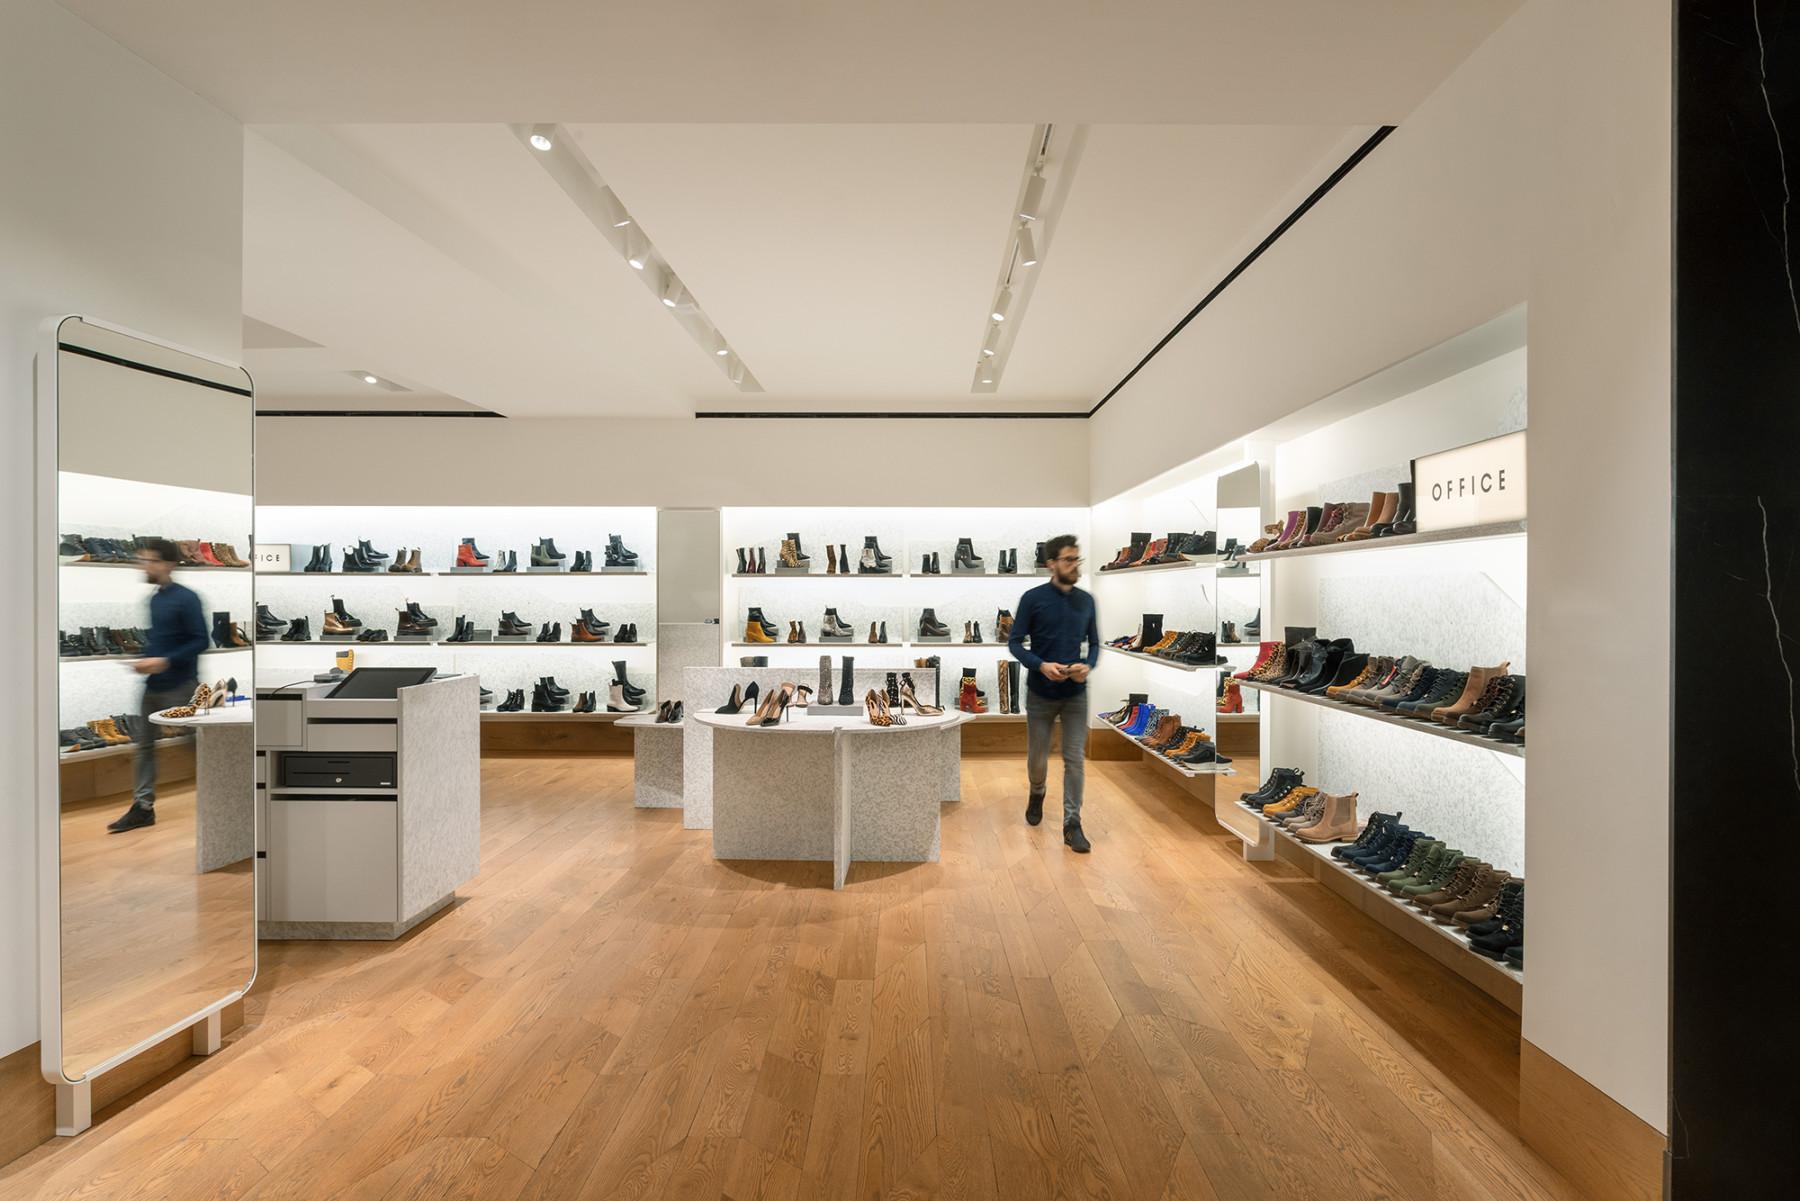 jamie-fobert-architects-selfridges-shoe-galleries-luxury-retail-concept-gallery-design-olivier-hess-photos-(2)